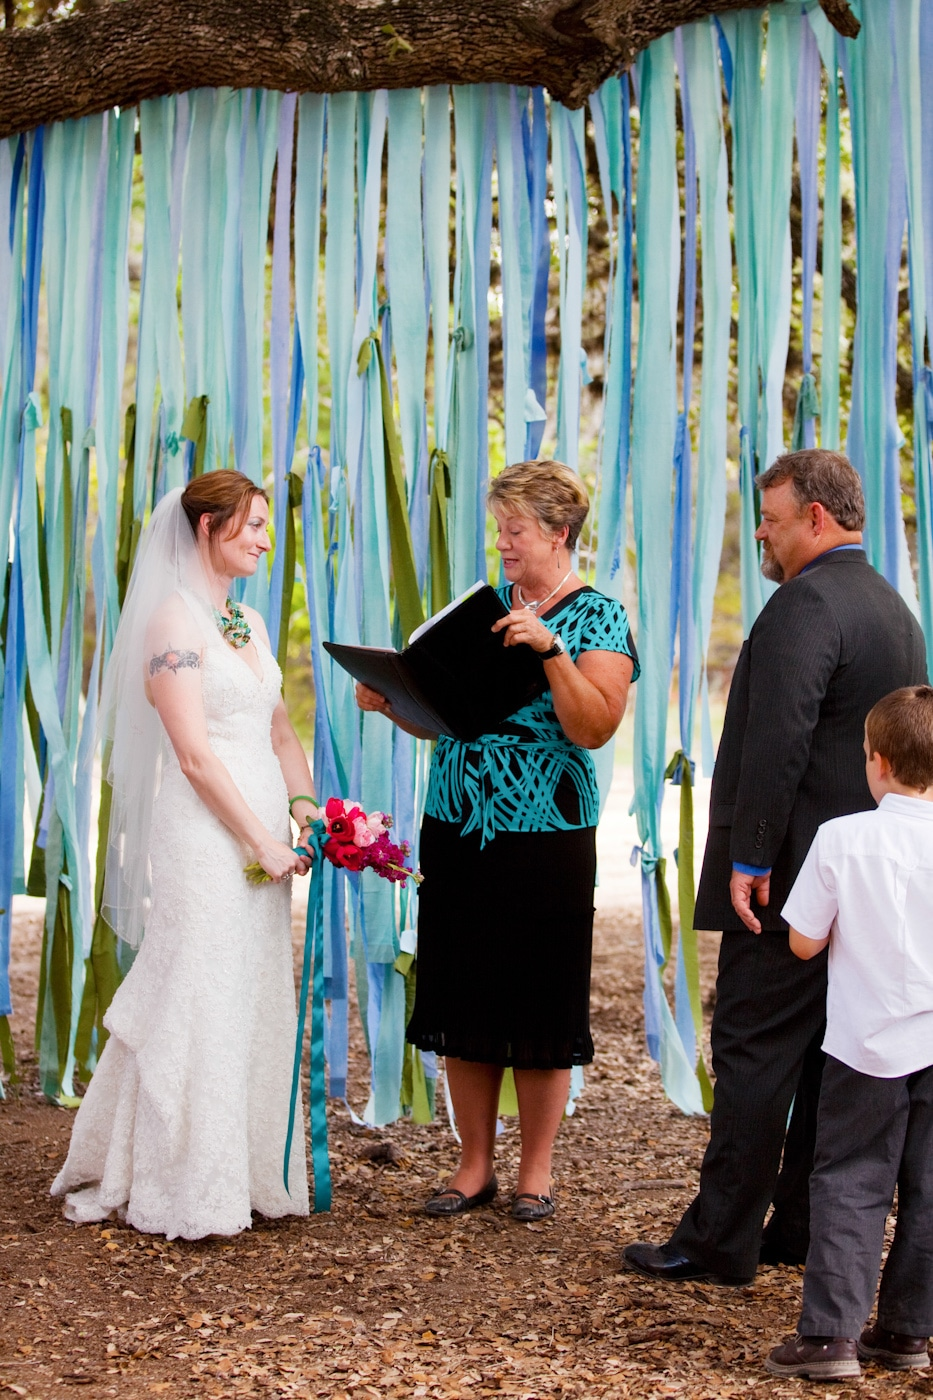 Wedding Wednesday: DIY Fabric Streamer Ceremony Backdrop